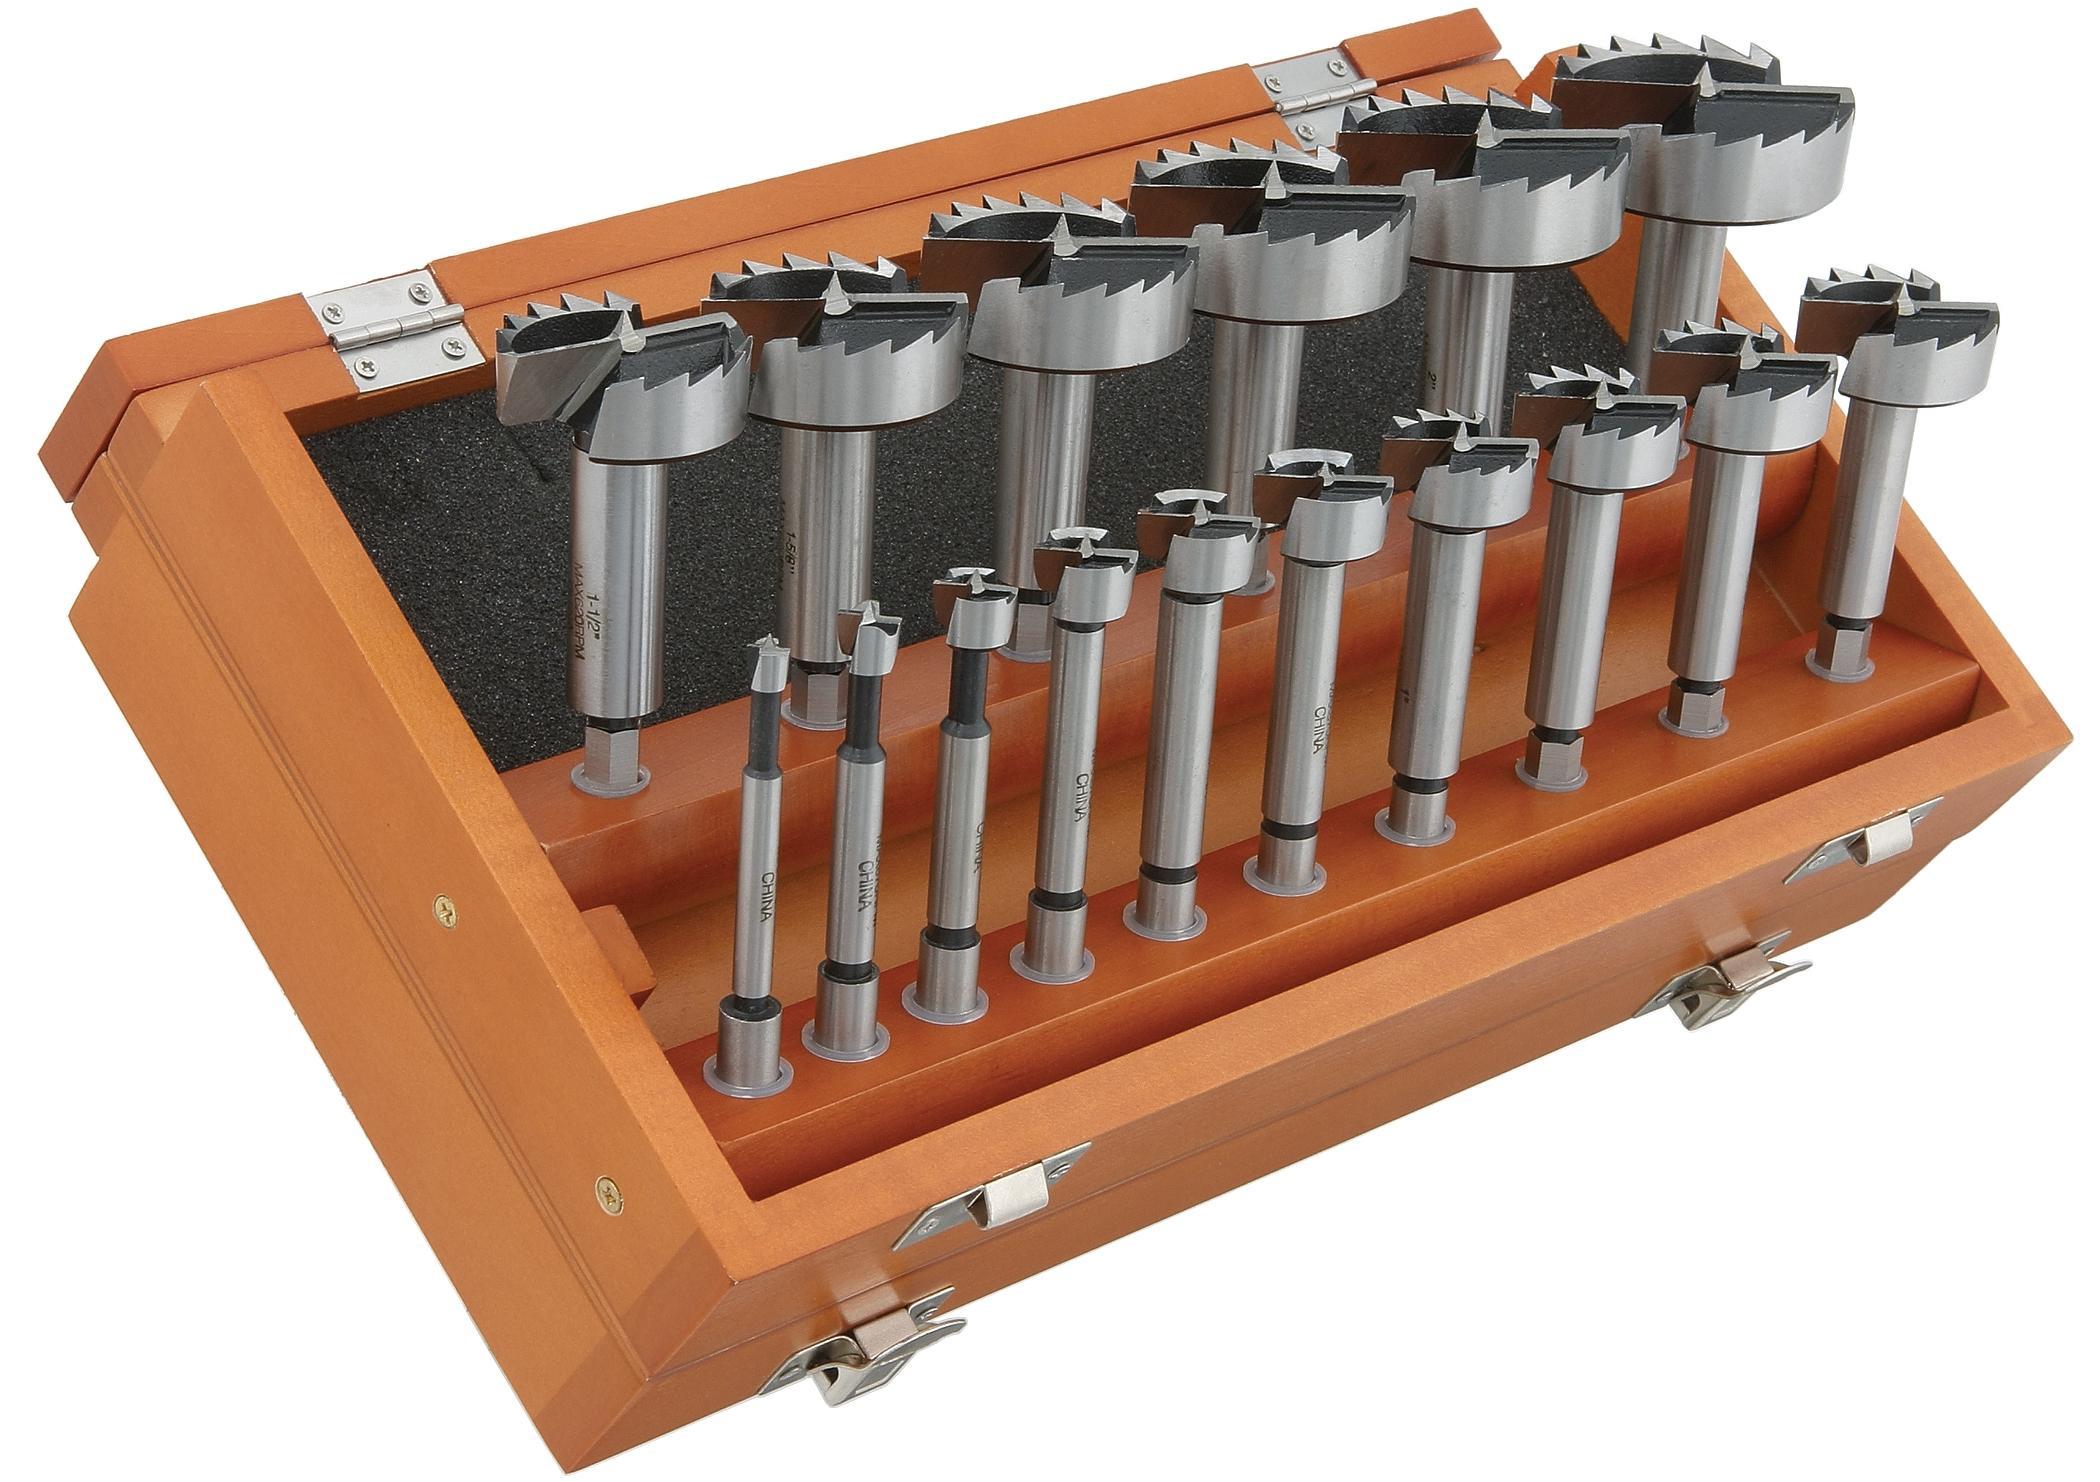 forstner drill bit set. from the manufacturer forstner drill bit set